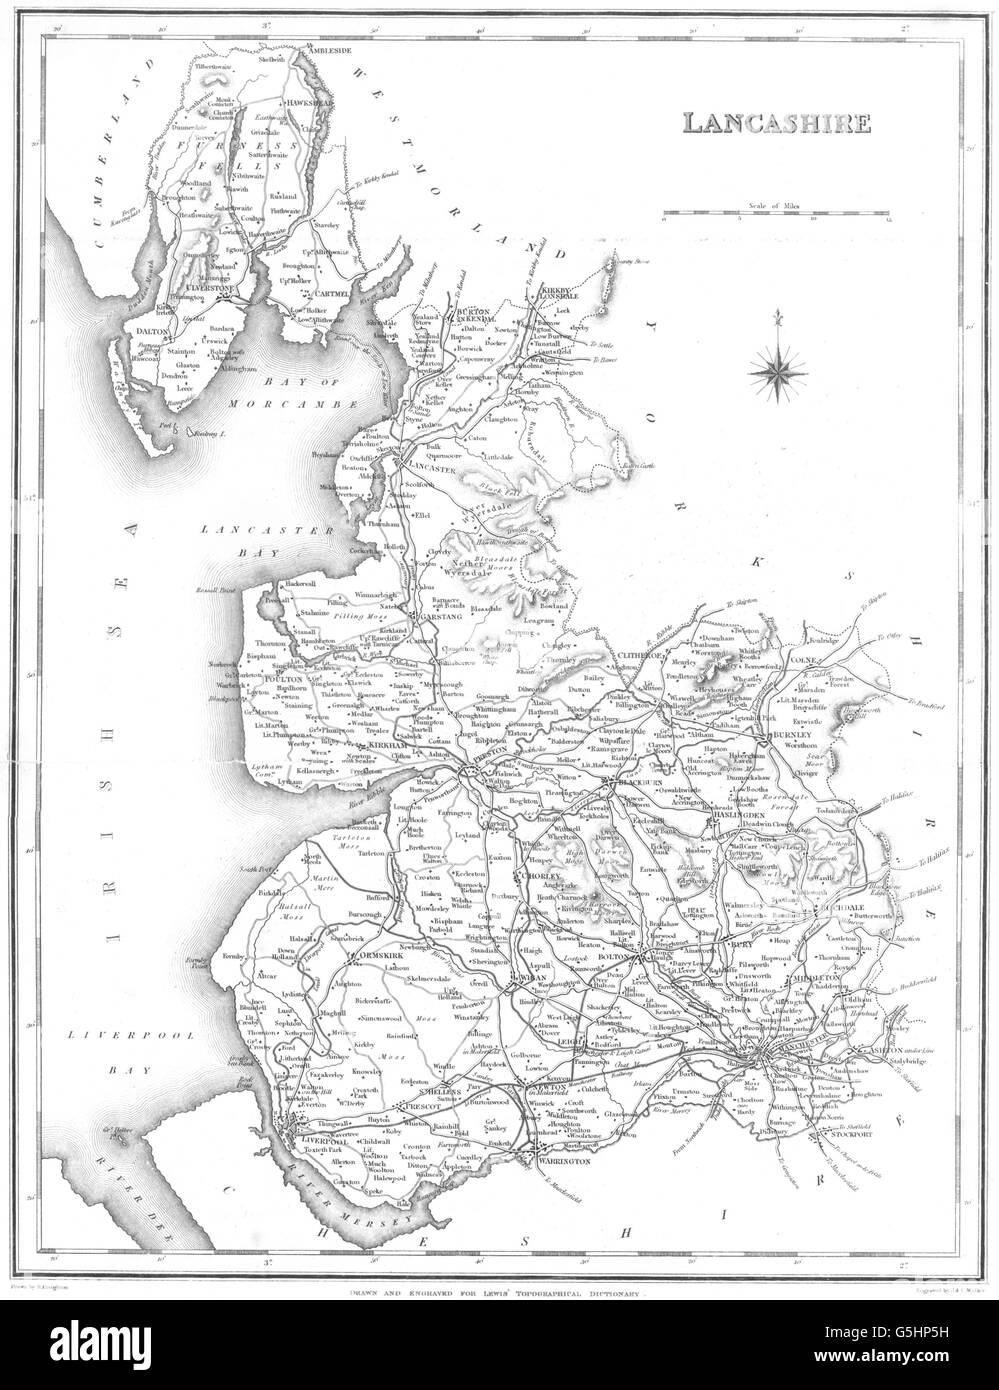 Topographical Dictionary England Lancashire Map Stock Photos - Antique map box